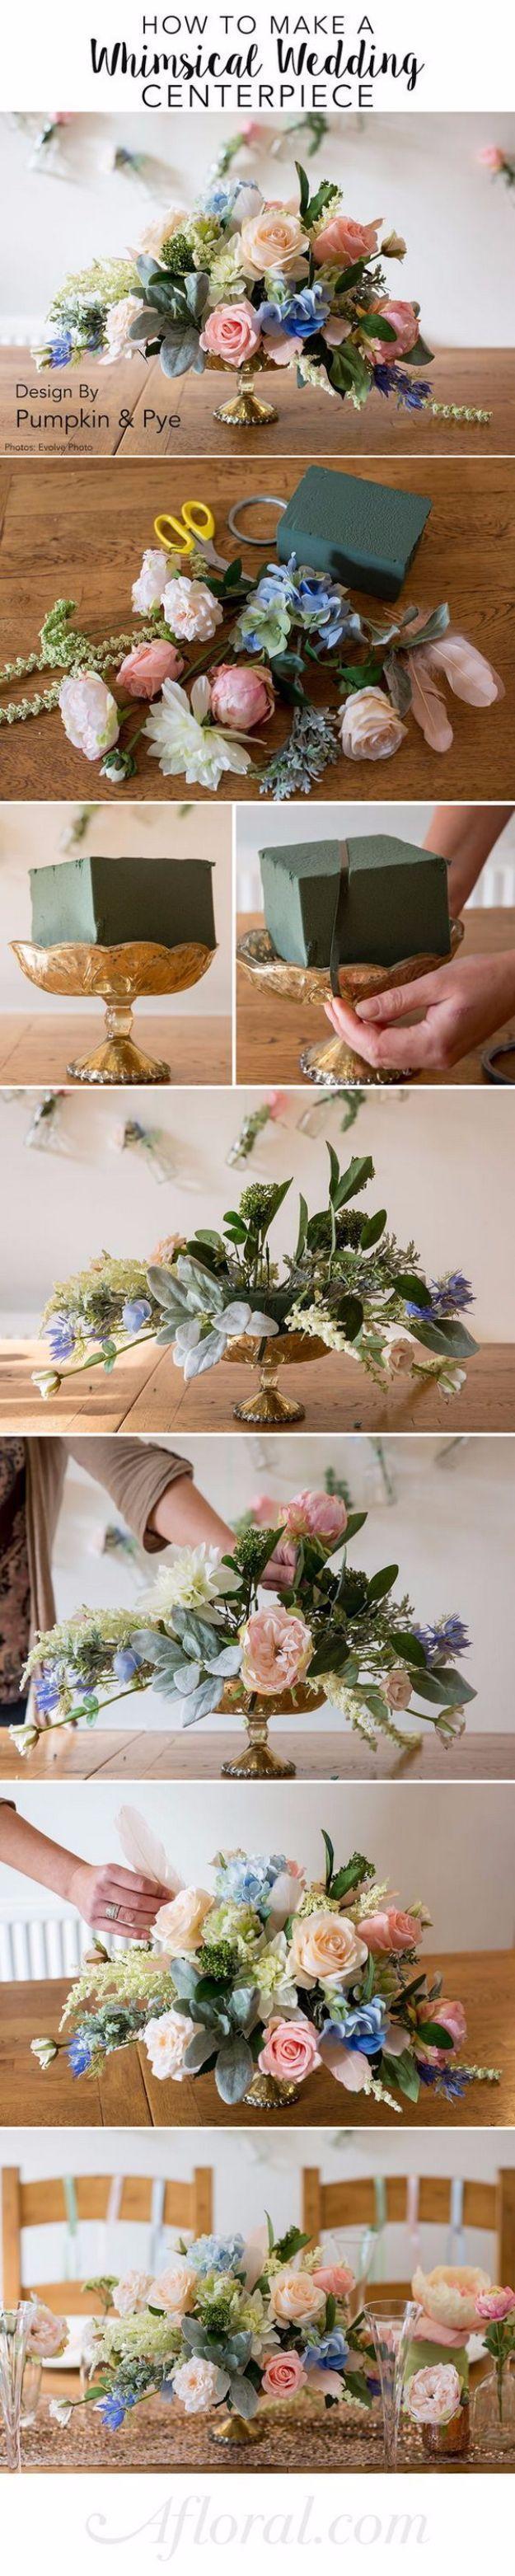 DIY Wedding Centerpieces  DIY Whimsical Wedding Centerpiece  Do It